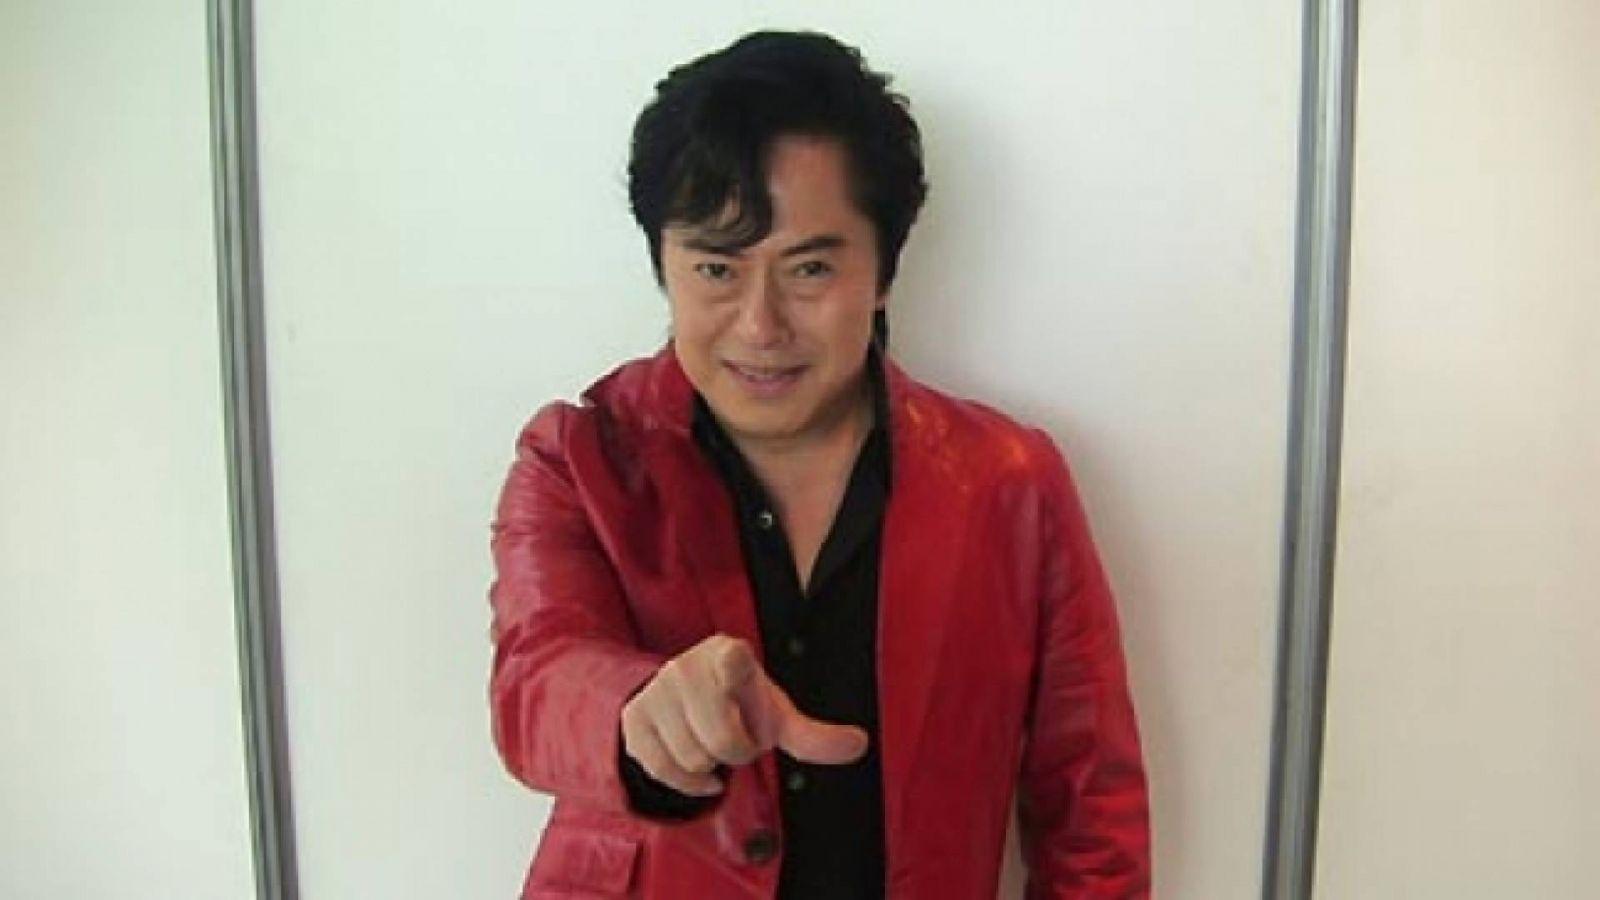 Entrevista com Ichirou Mizuki na Japan Expo © JaME & Ichirou MIZUKI  ・ yellow bird